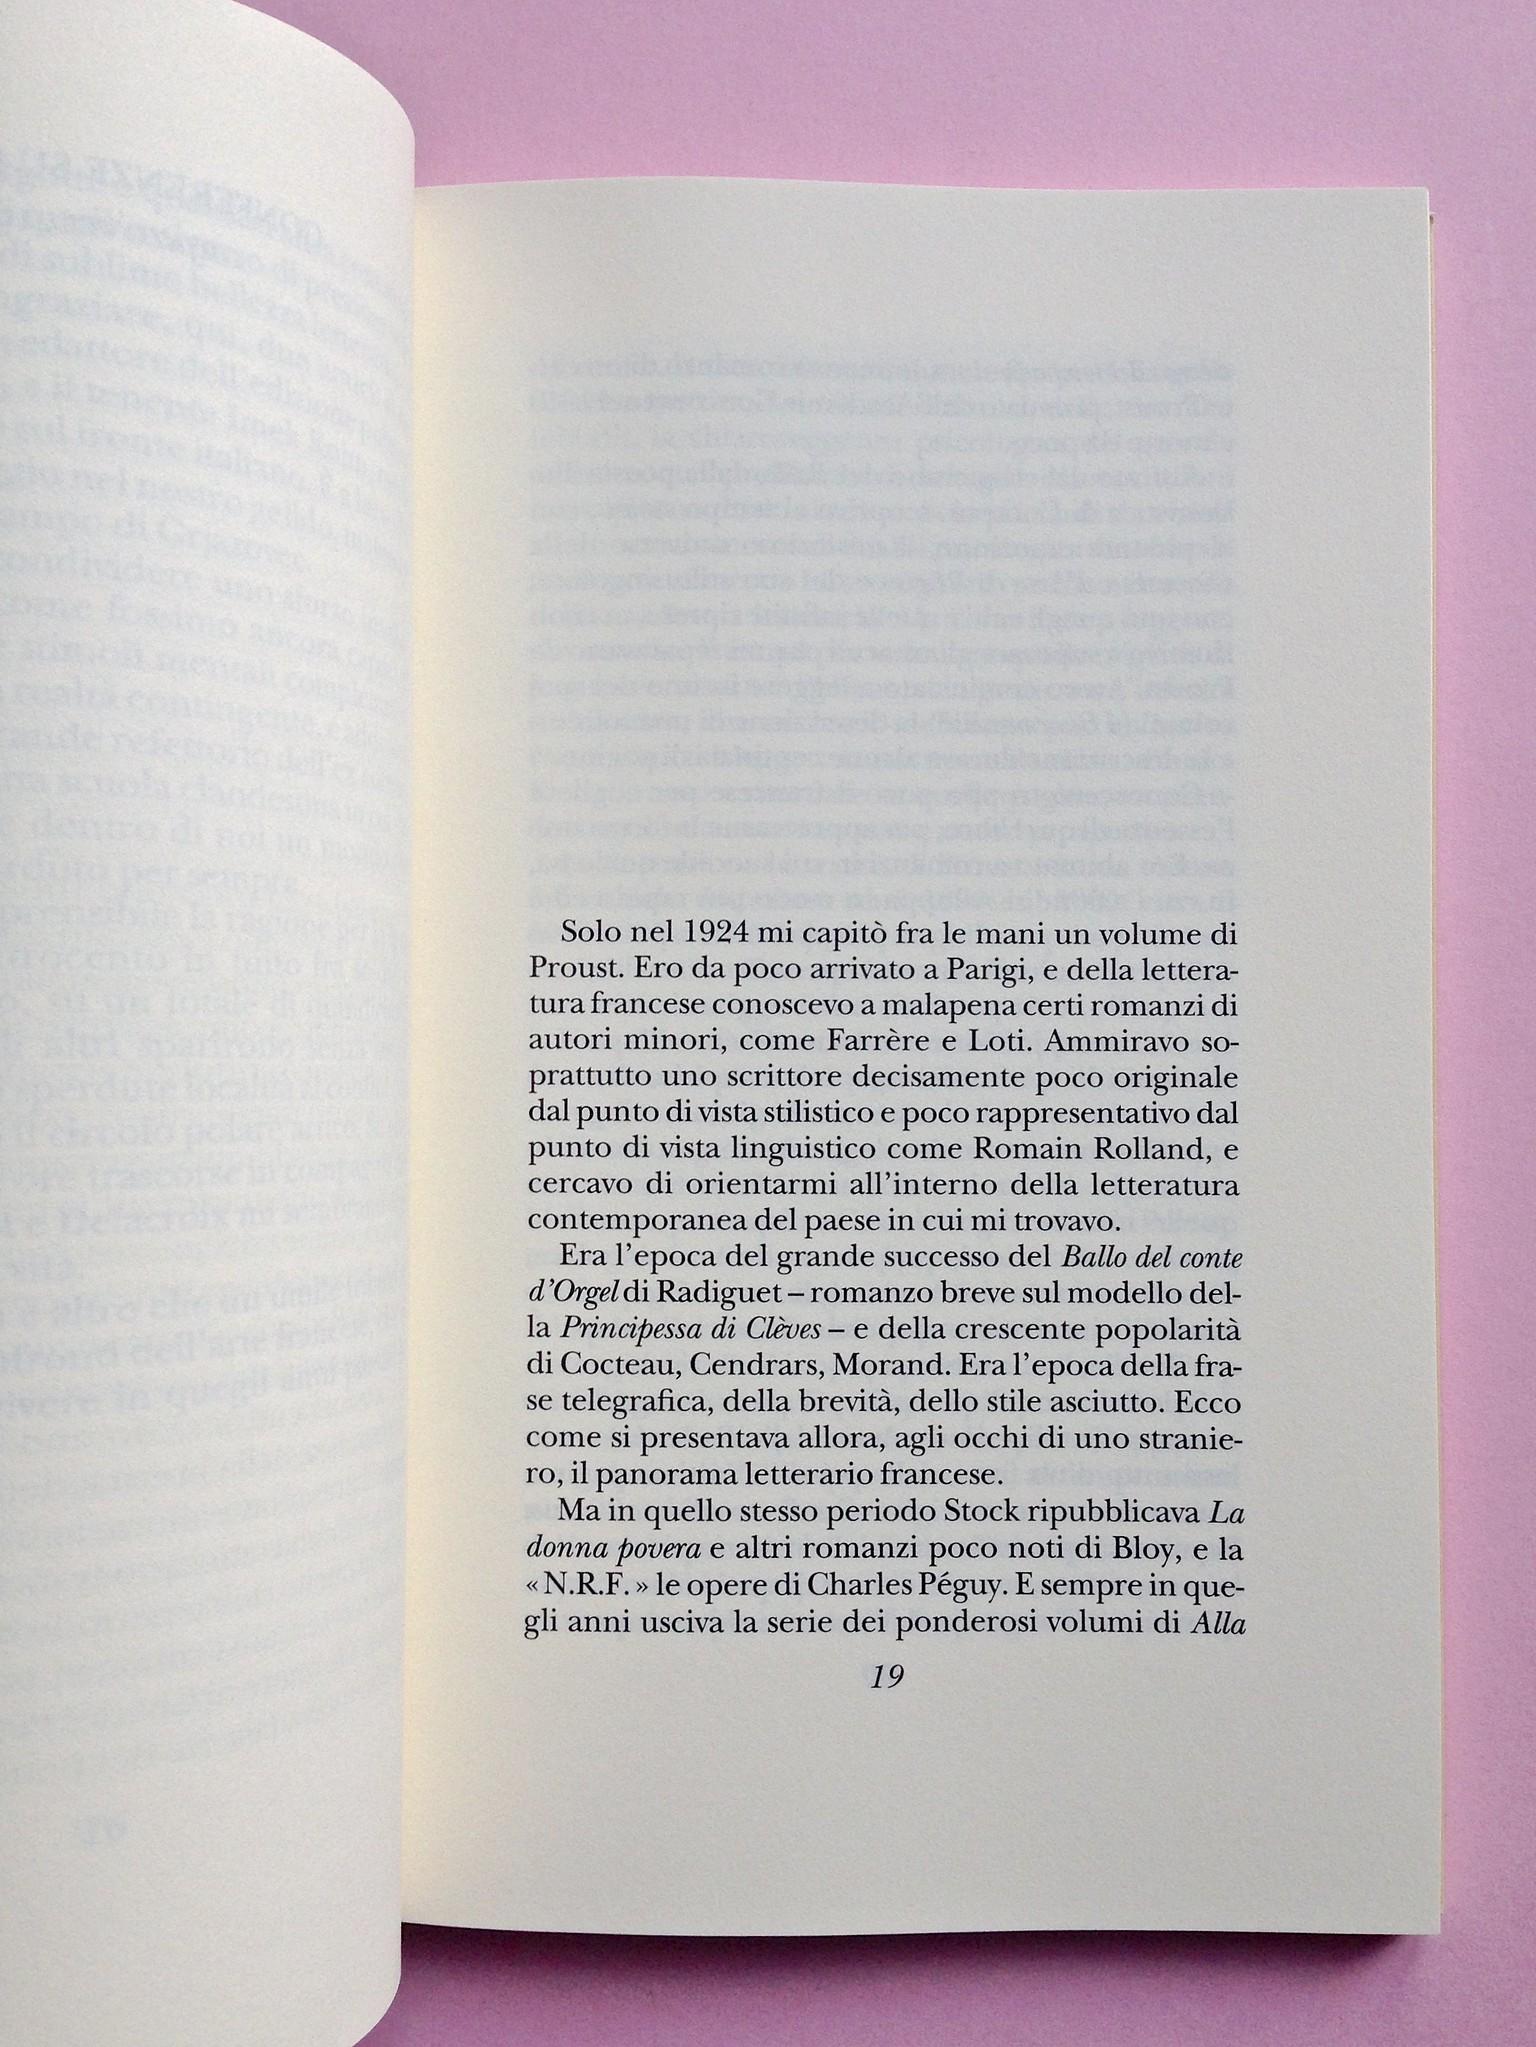 Proust a Grjazovec, di Józef Czapski. Adelphi 2015. Resp. grafica non indicata. Incipit, a pag. 19 (part.), 1